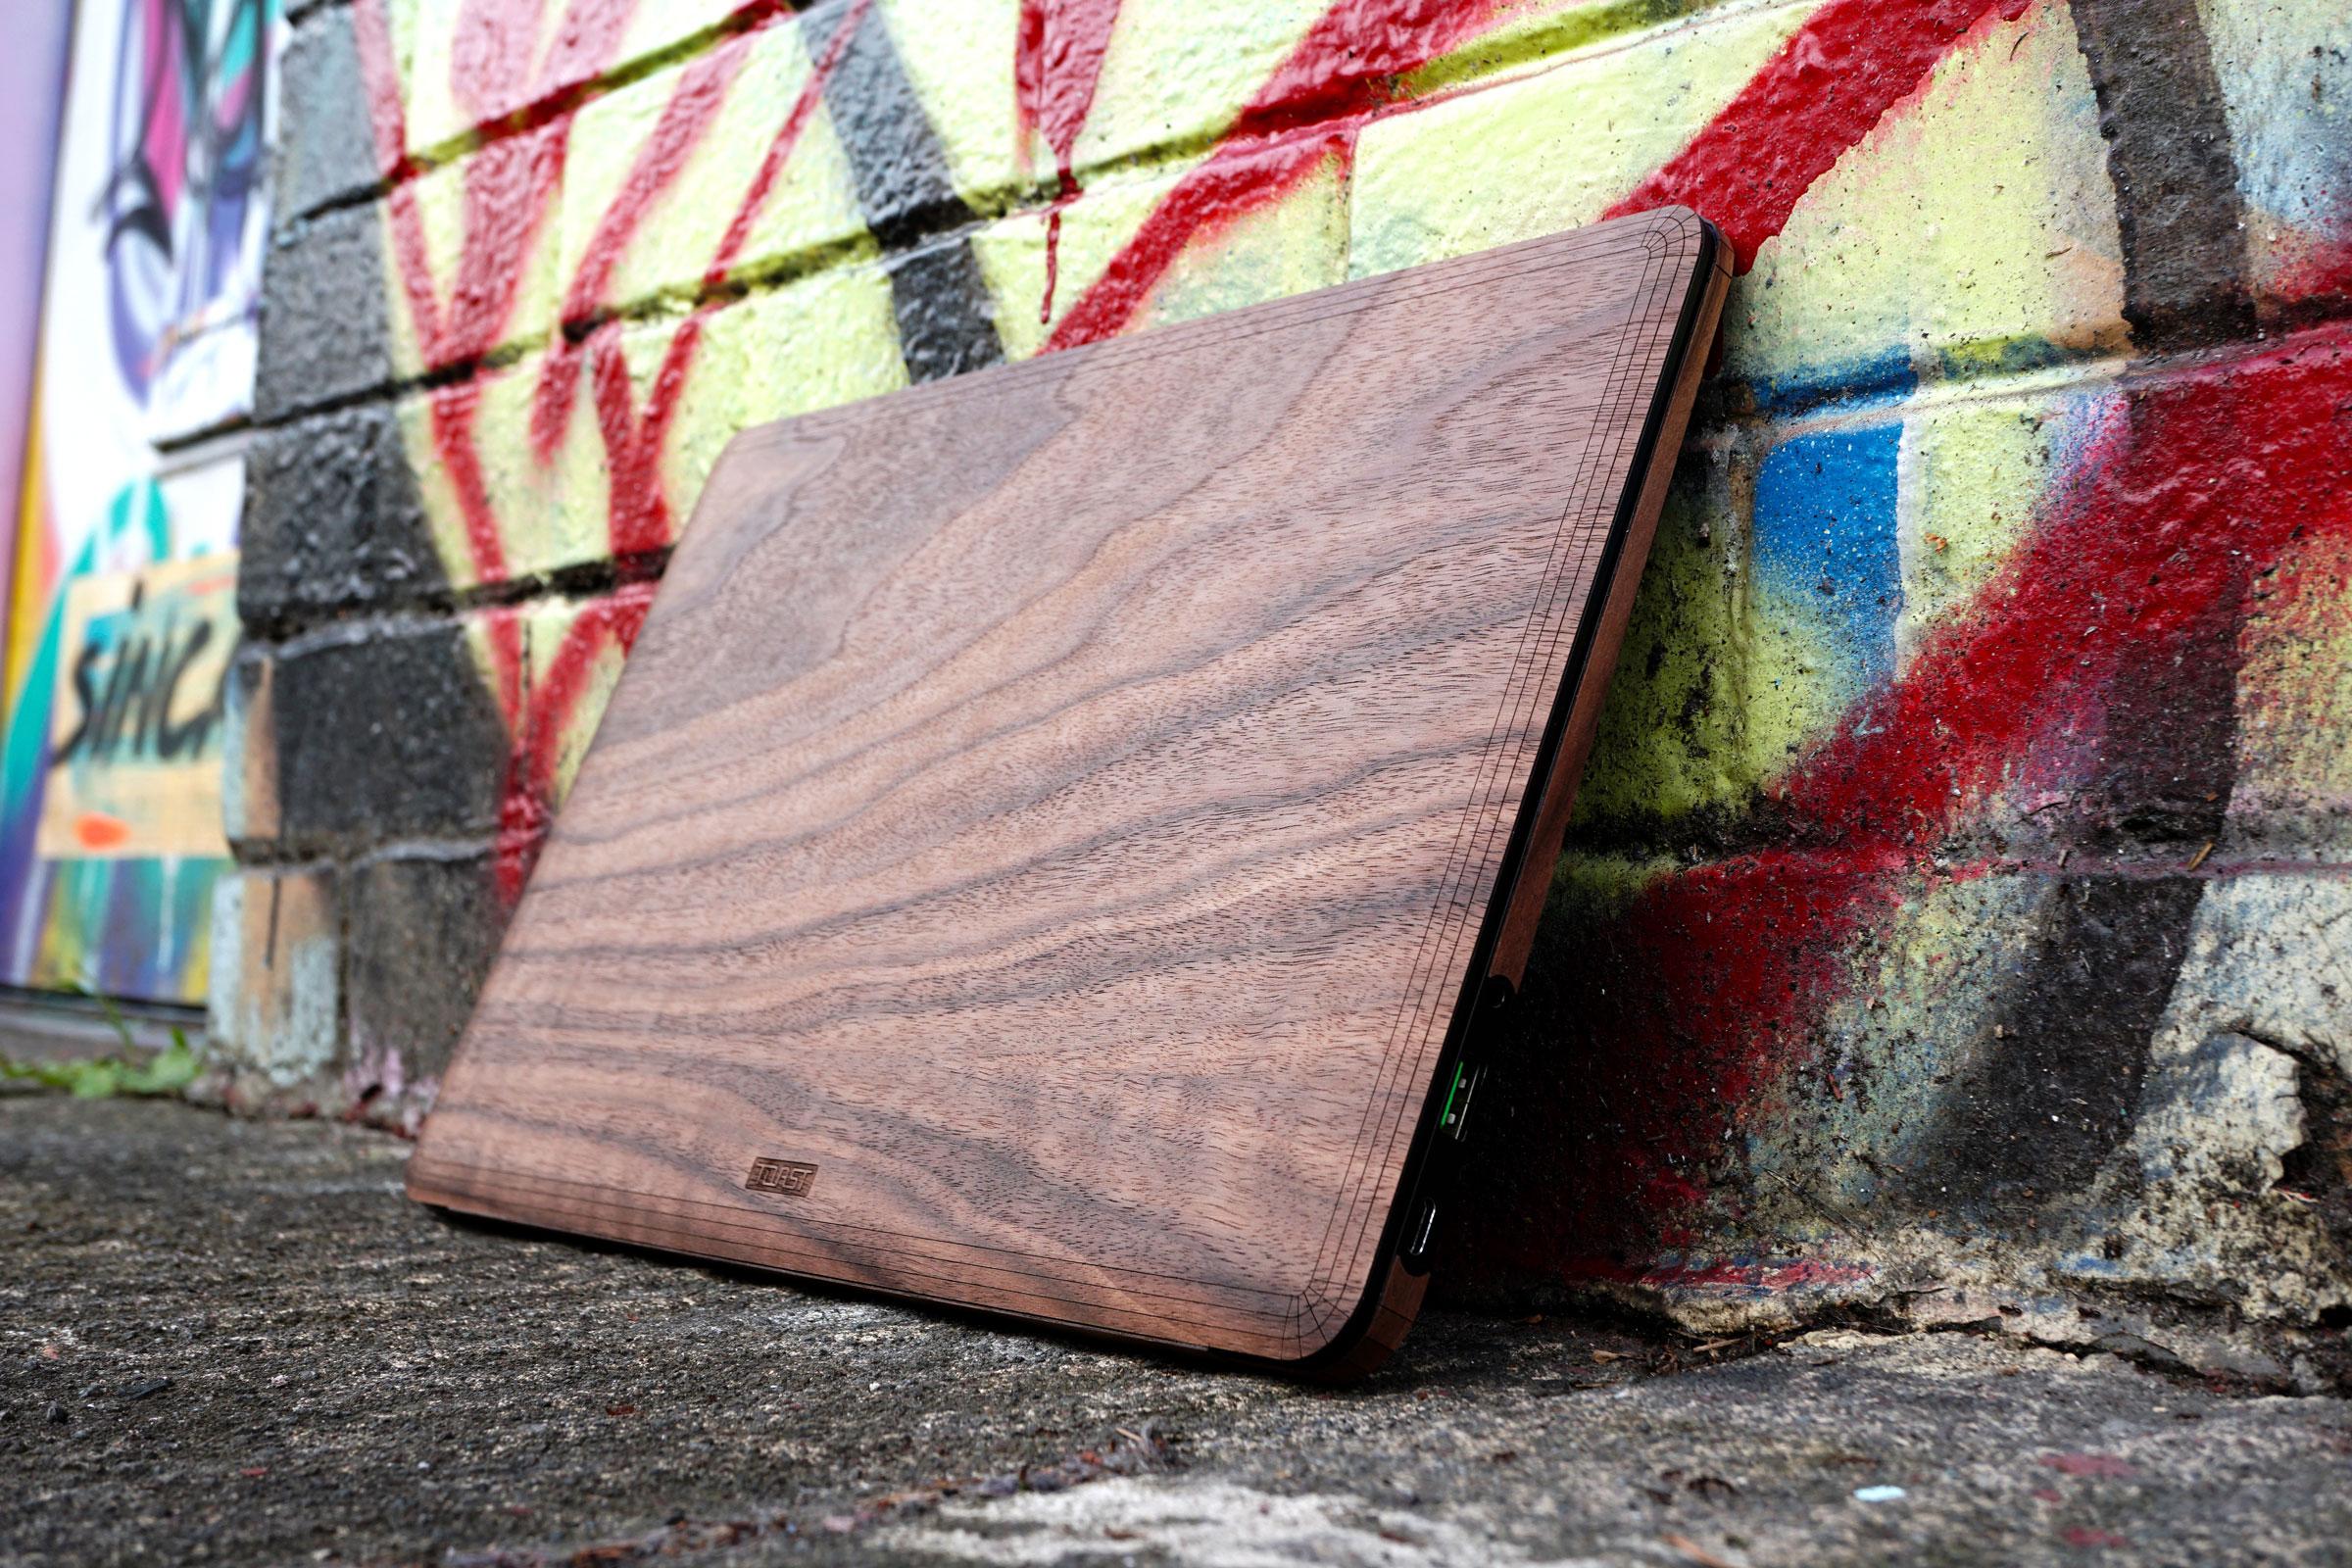 razer-with-graffiti-wall.jpg